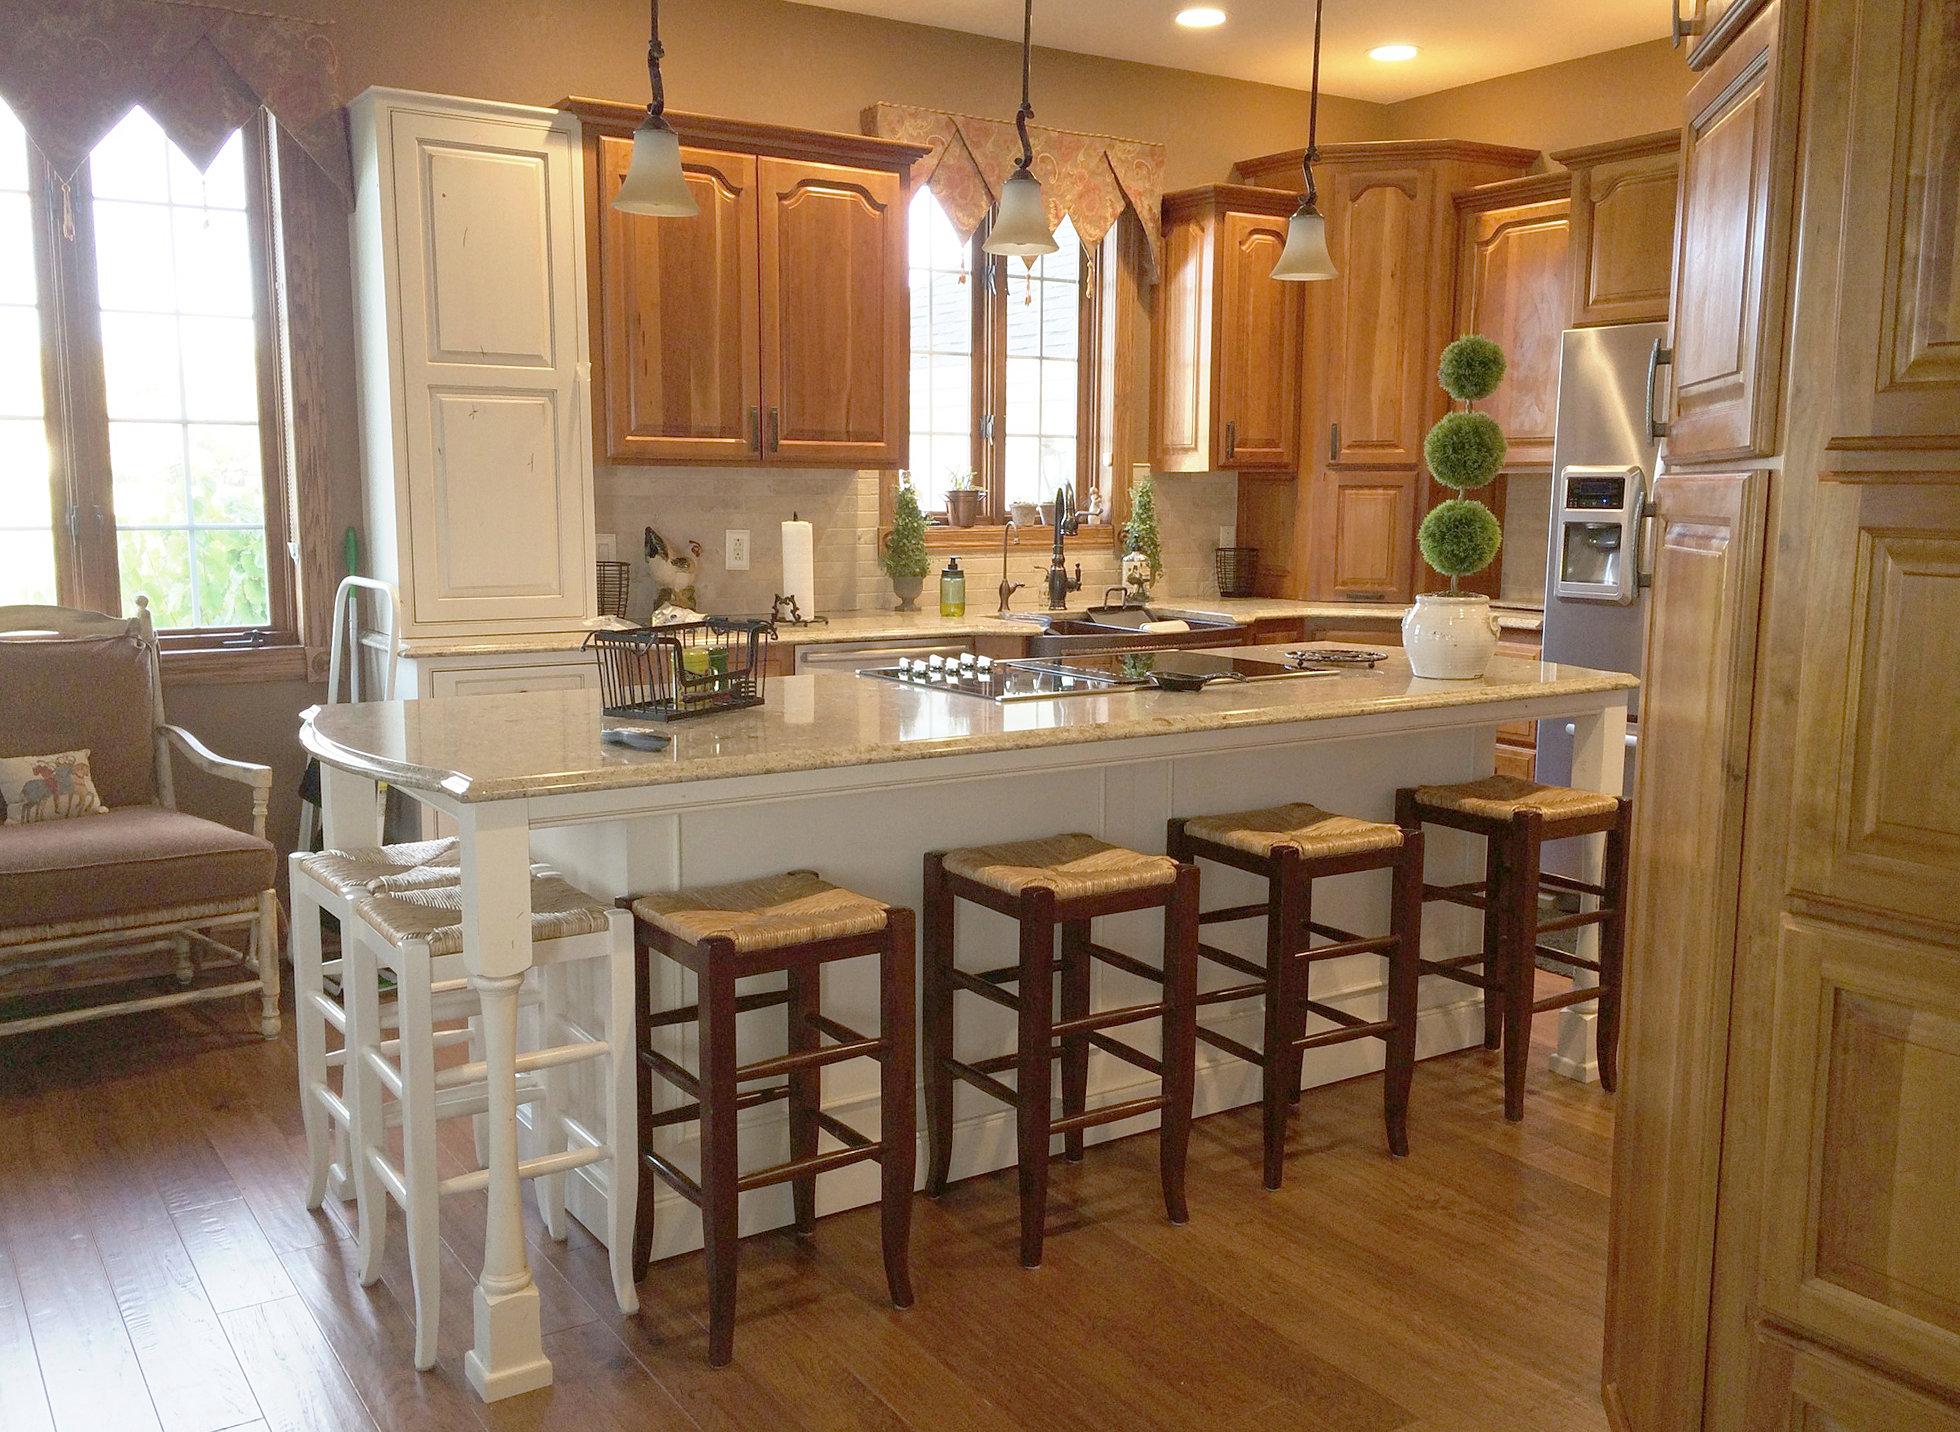 kitchen cabinets and kitchen remodeler in des moines iowa kitchen cabinets des moines for your home kitchen cabinets